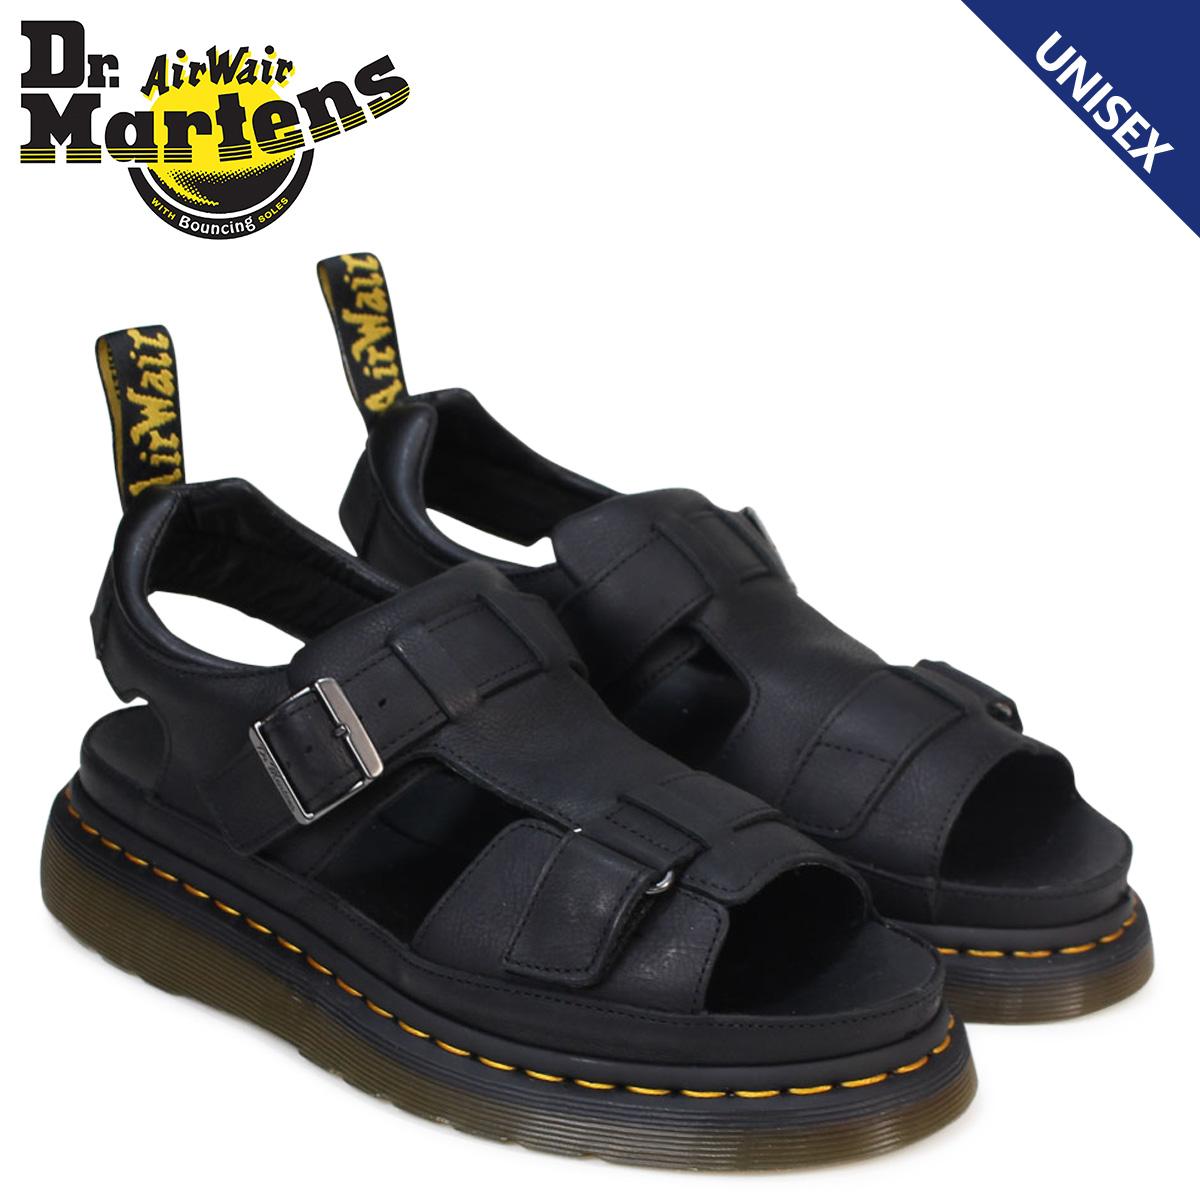 博士马丁凉鞋女士人Dr.Martens皮革SHORE HAYDEN GRUNGE SANDAL R22168001黑色[3/29新进货]